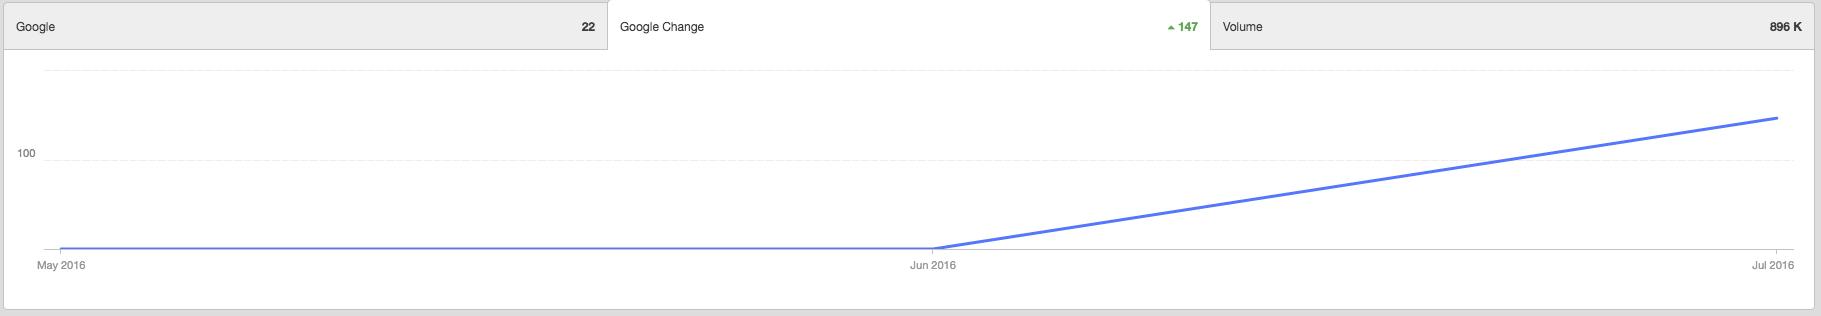 rankings graph